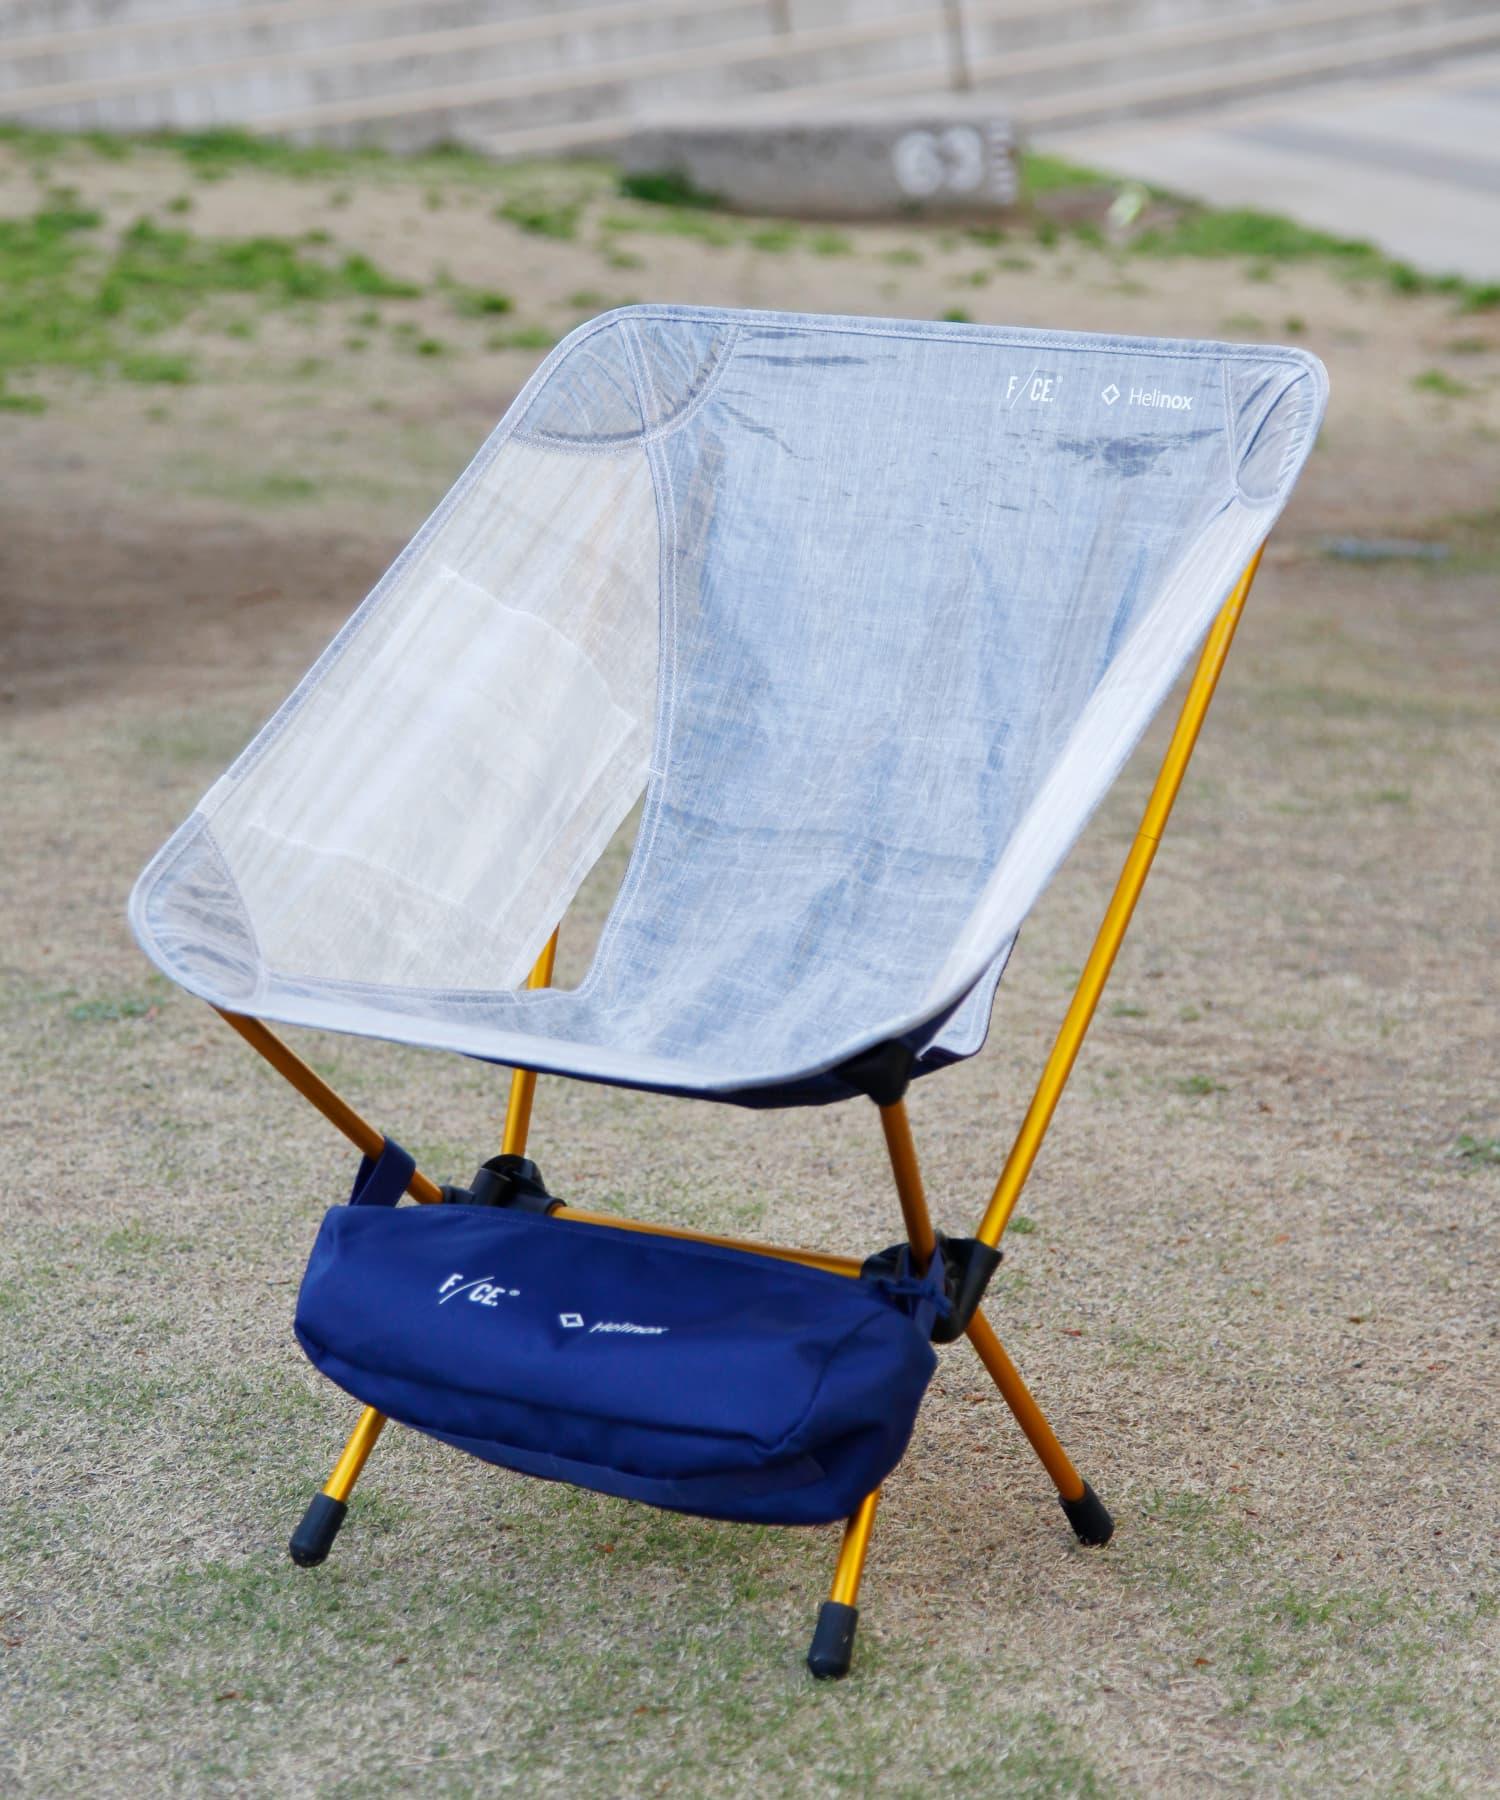 #149-F/CE.×Helinox Tactical Chair Dyneema-